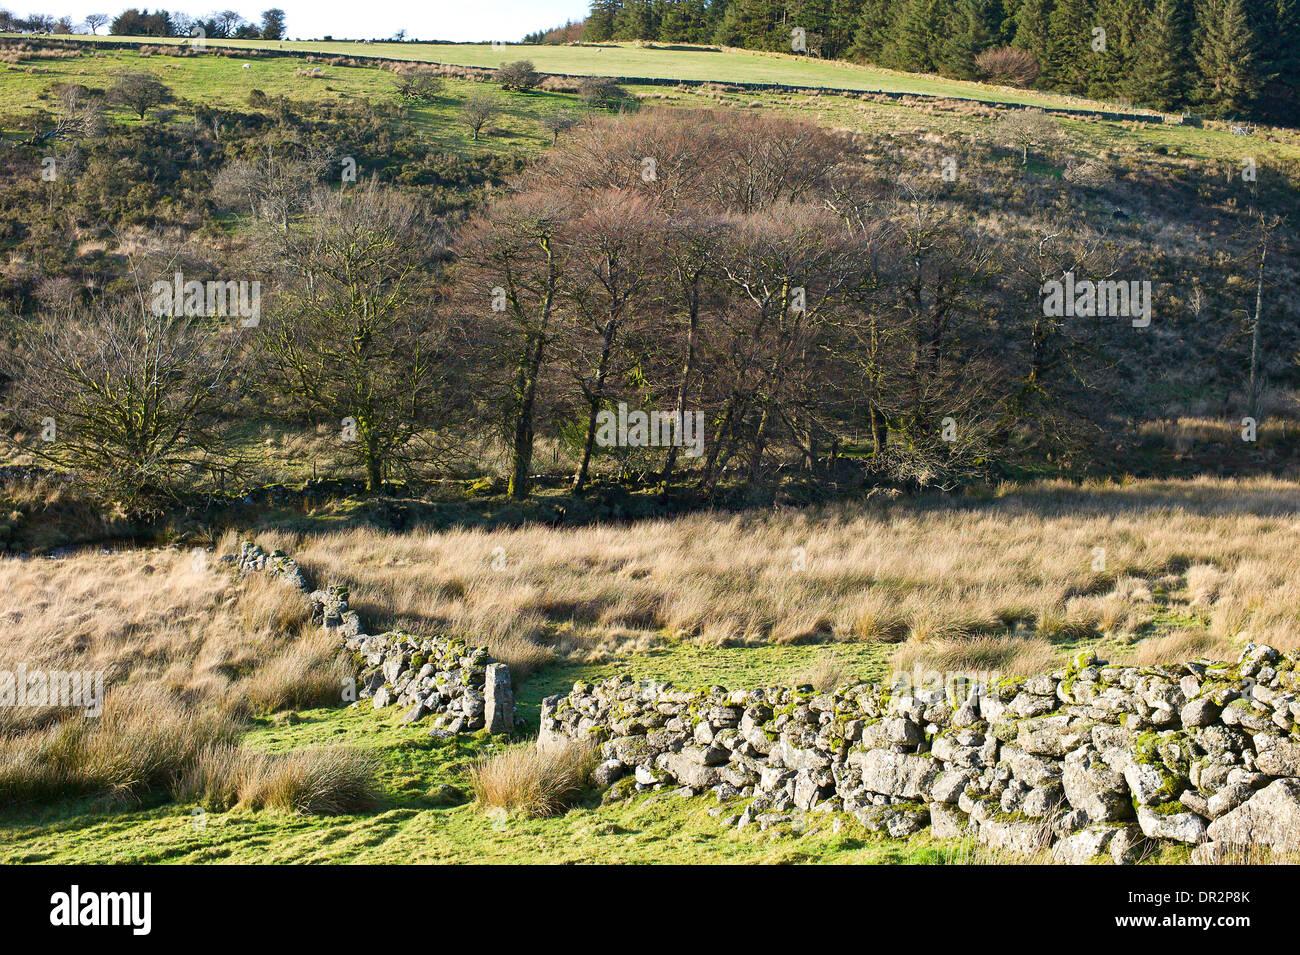 West Dart river valley and Beardown Hill near Two Bridges, Dartmoor, Devon - Stock Image